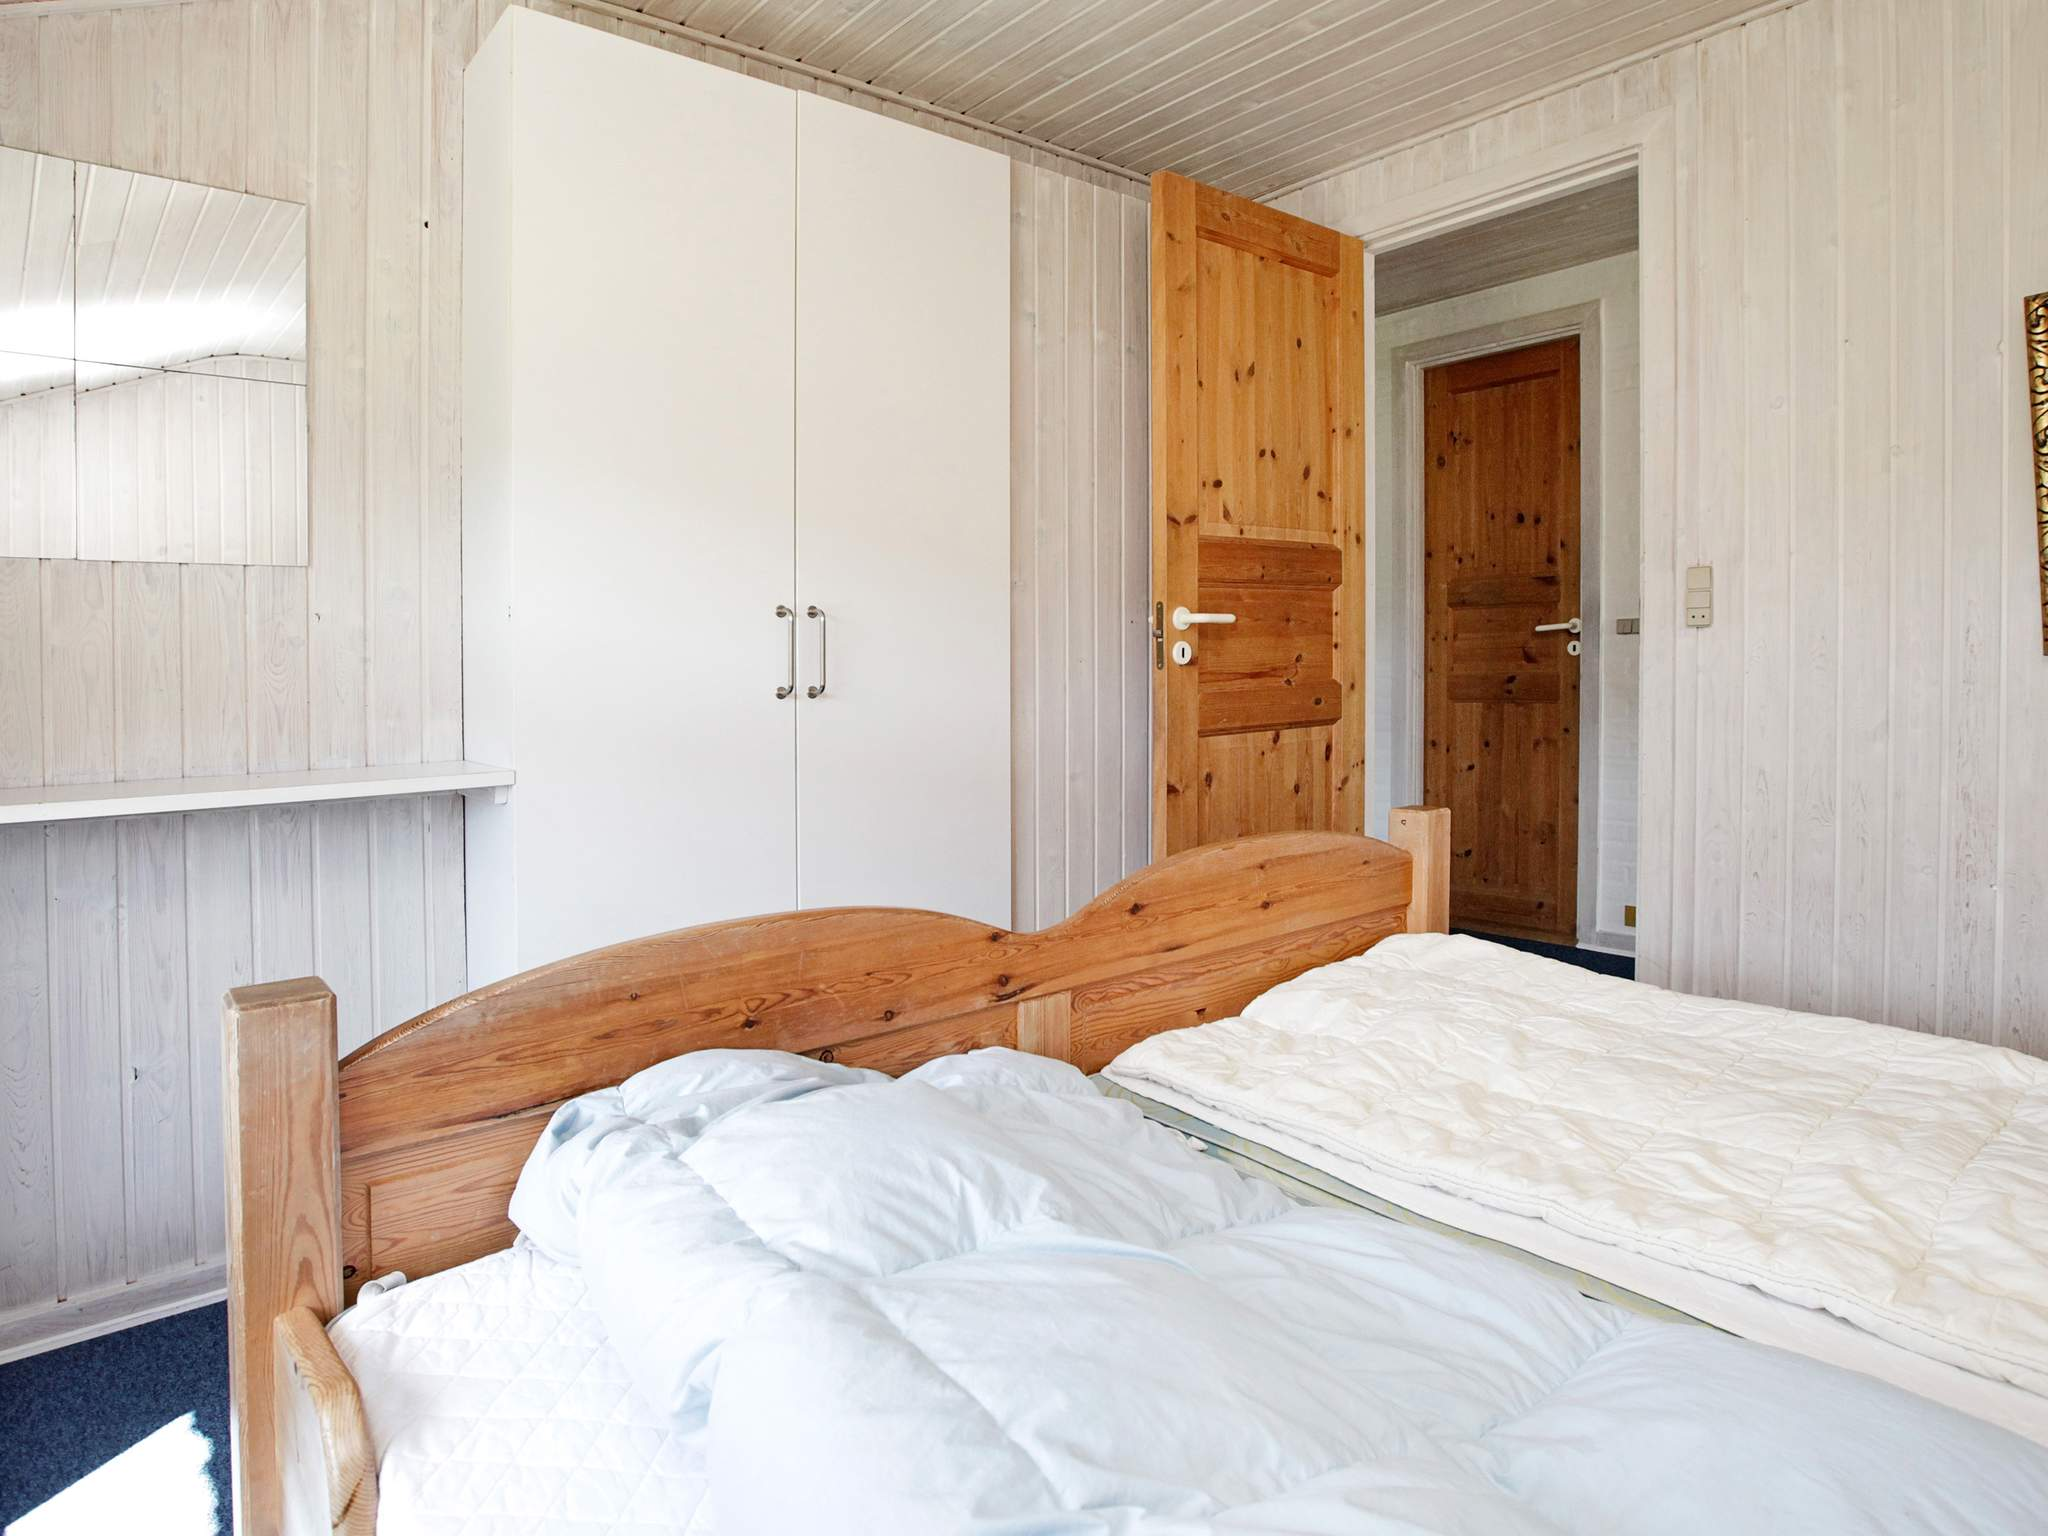 Ferienhaus Blåvand (88586), Blåvand, , Westjütland, Dänemark, Bild 9